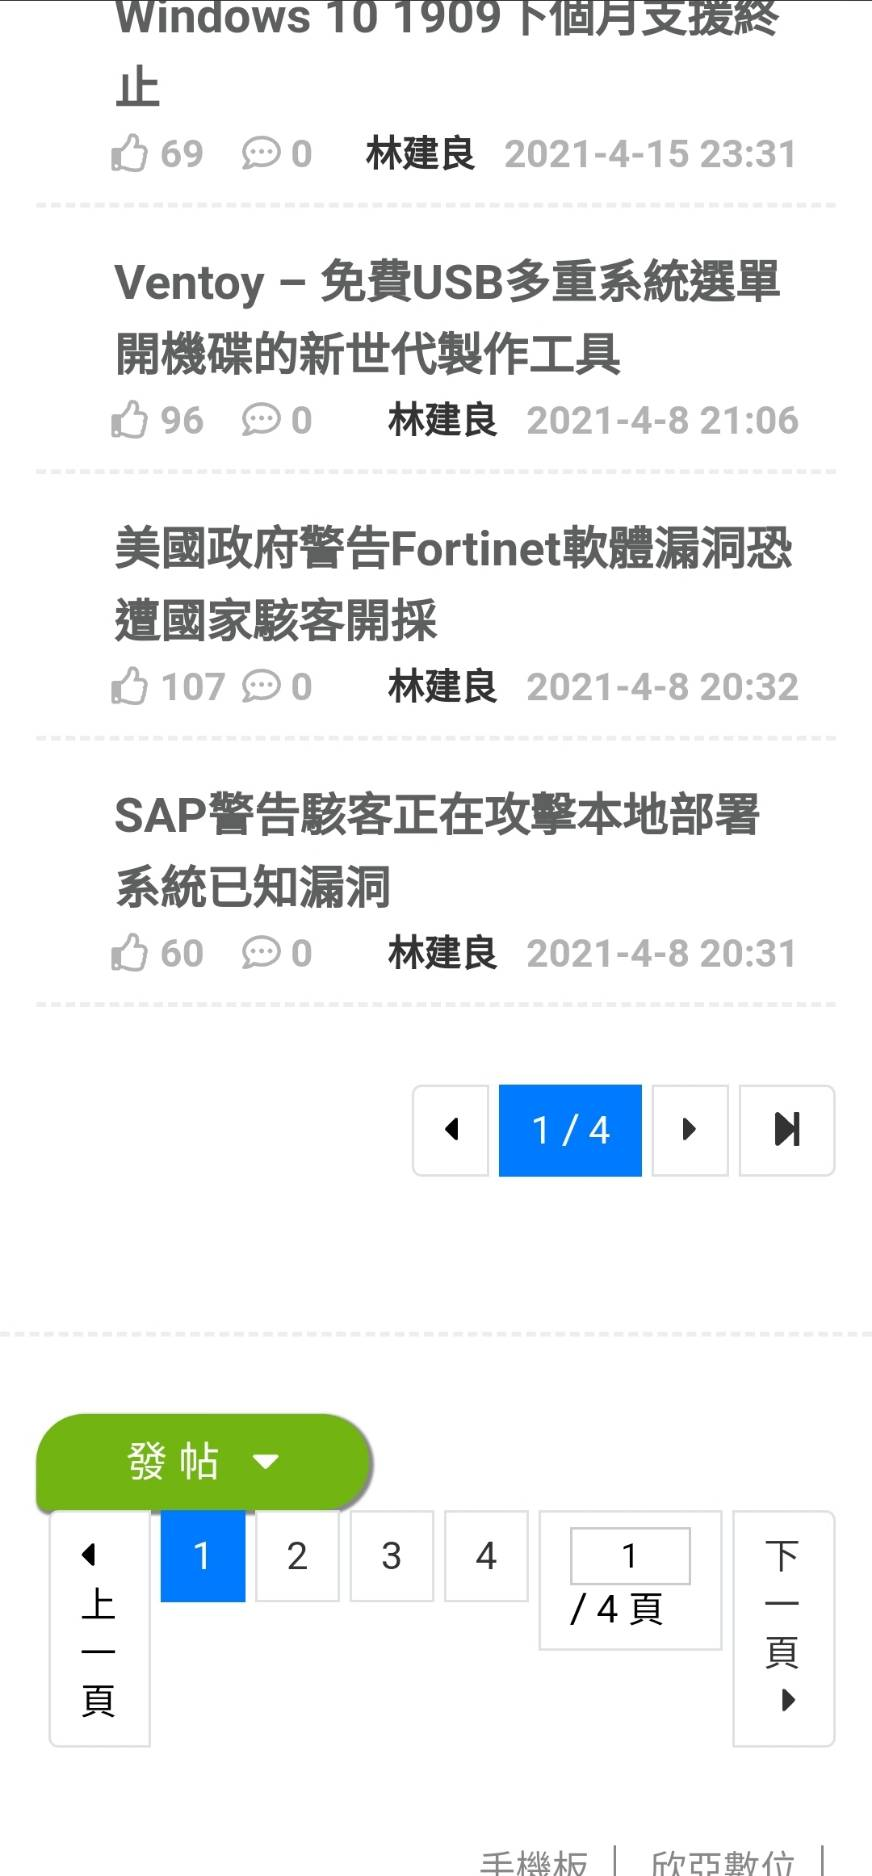 http://forum.sinya.com.tw/upload/attachment/2021/60a8a0602dcac3716.jpg